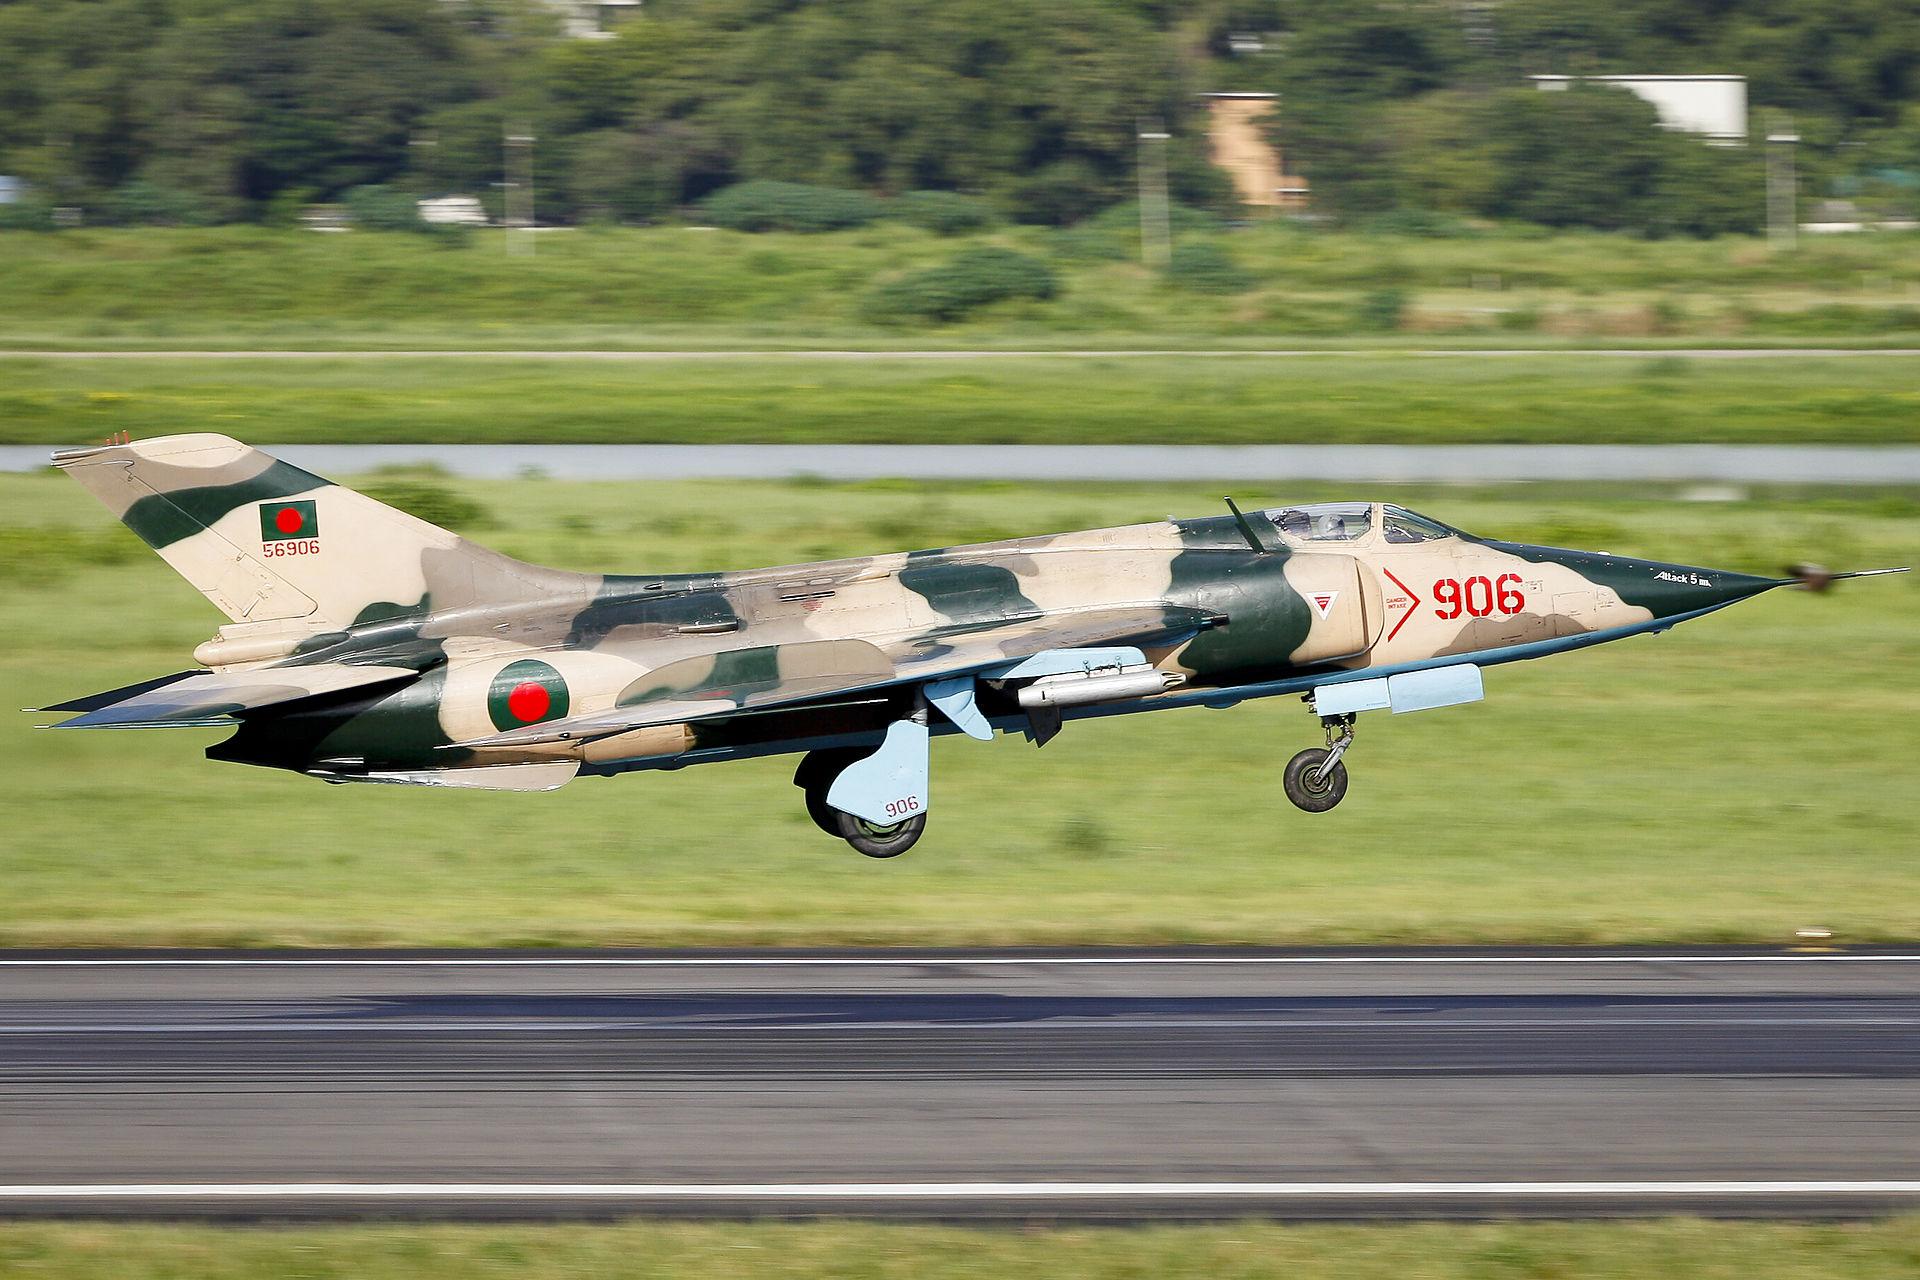 السودان ربما استلم اعداد اضافيه من مقاتلات Su-24 Fencer 1920px-906_Nanchang_A-5_Landing_%288138183528%29